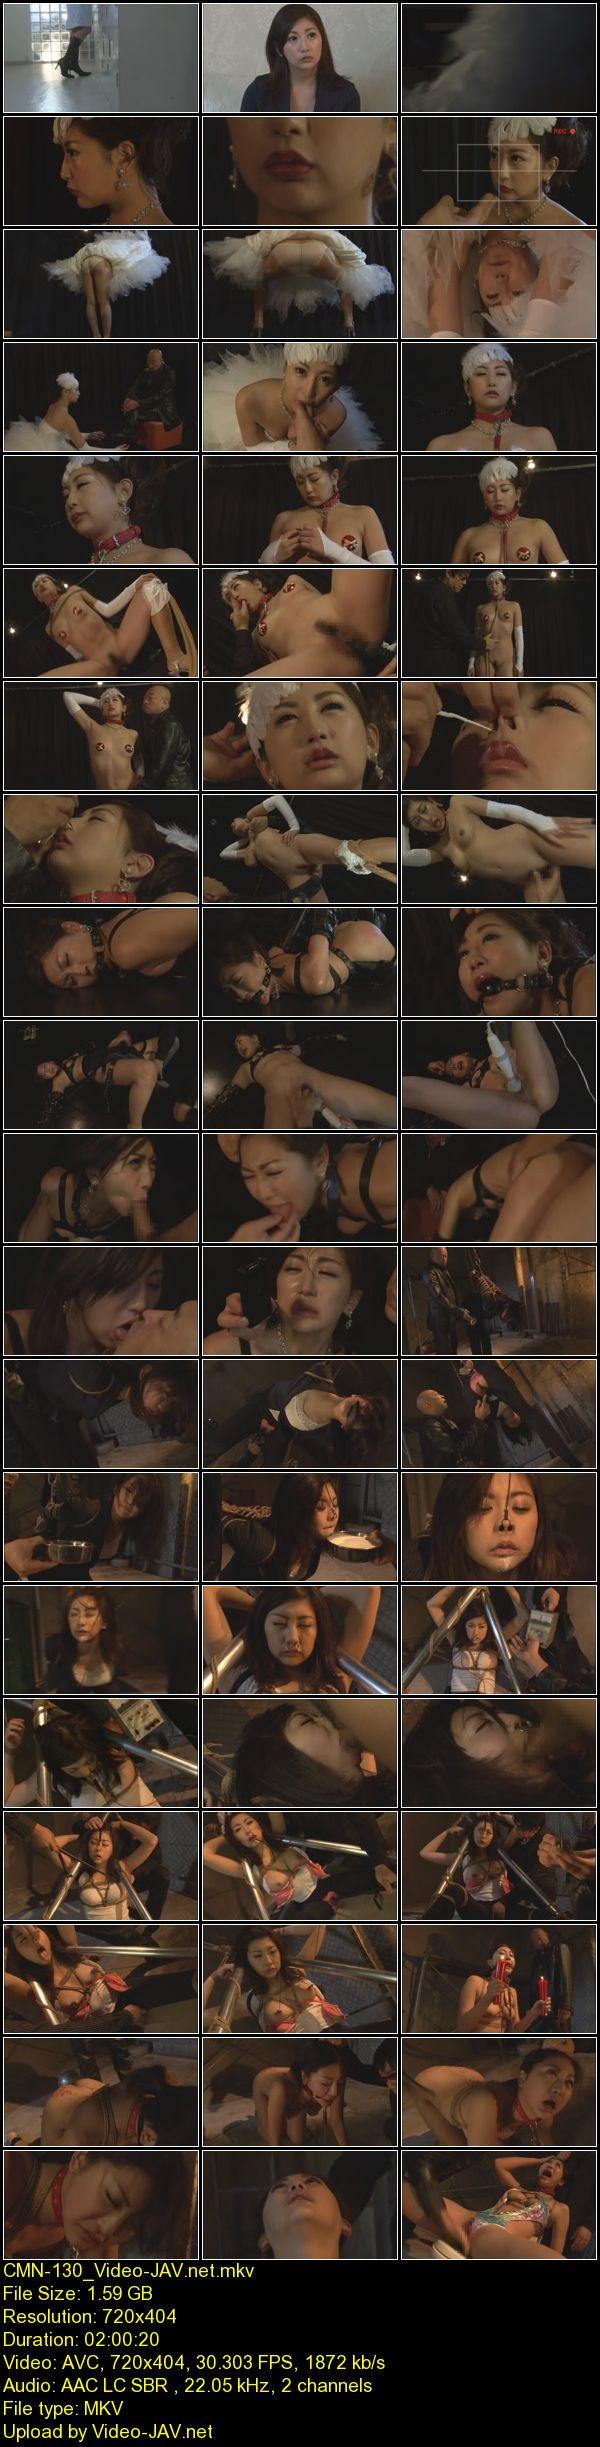 JAV Download Yuna Shiratori [CMN 130] 恥辱の女潜入捜査官9 炎隷のギャラクシー 白鳥ゆな コスチューム Squirting 拘束 Tied 2014 03 19